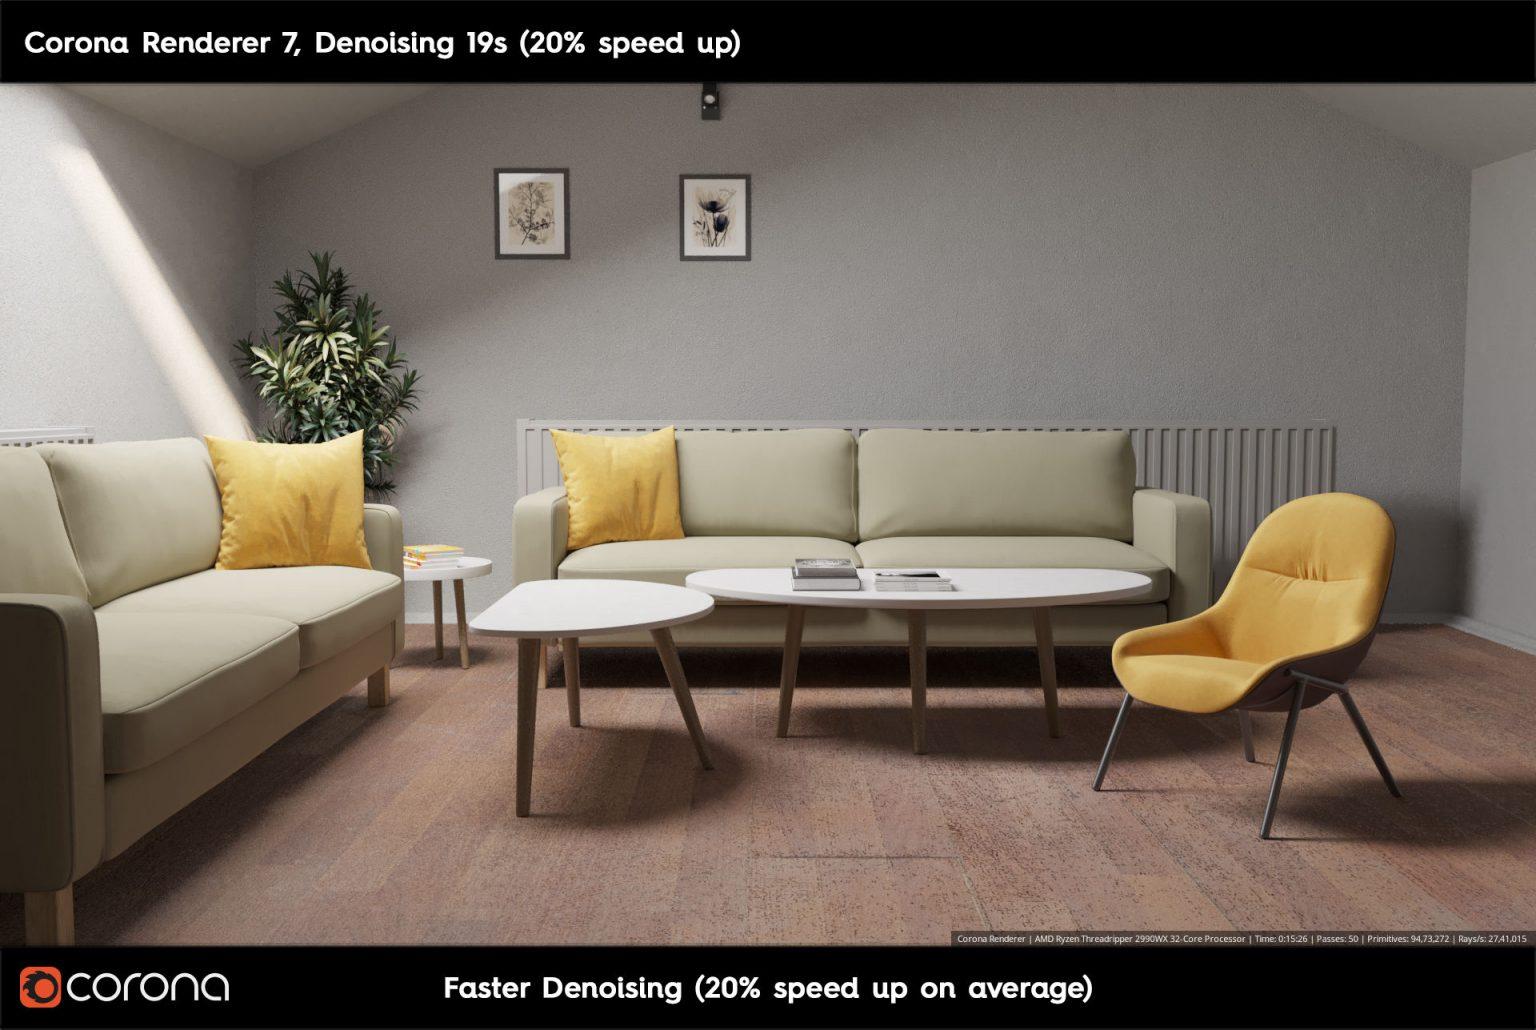 Corona Renderer 7: TUTTE LE NOVITA' - Fast Denoising A